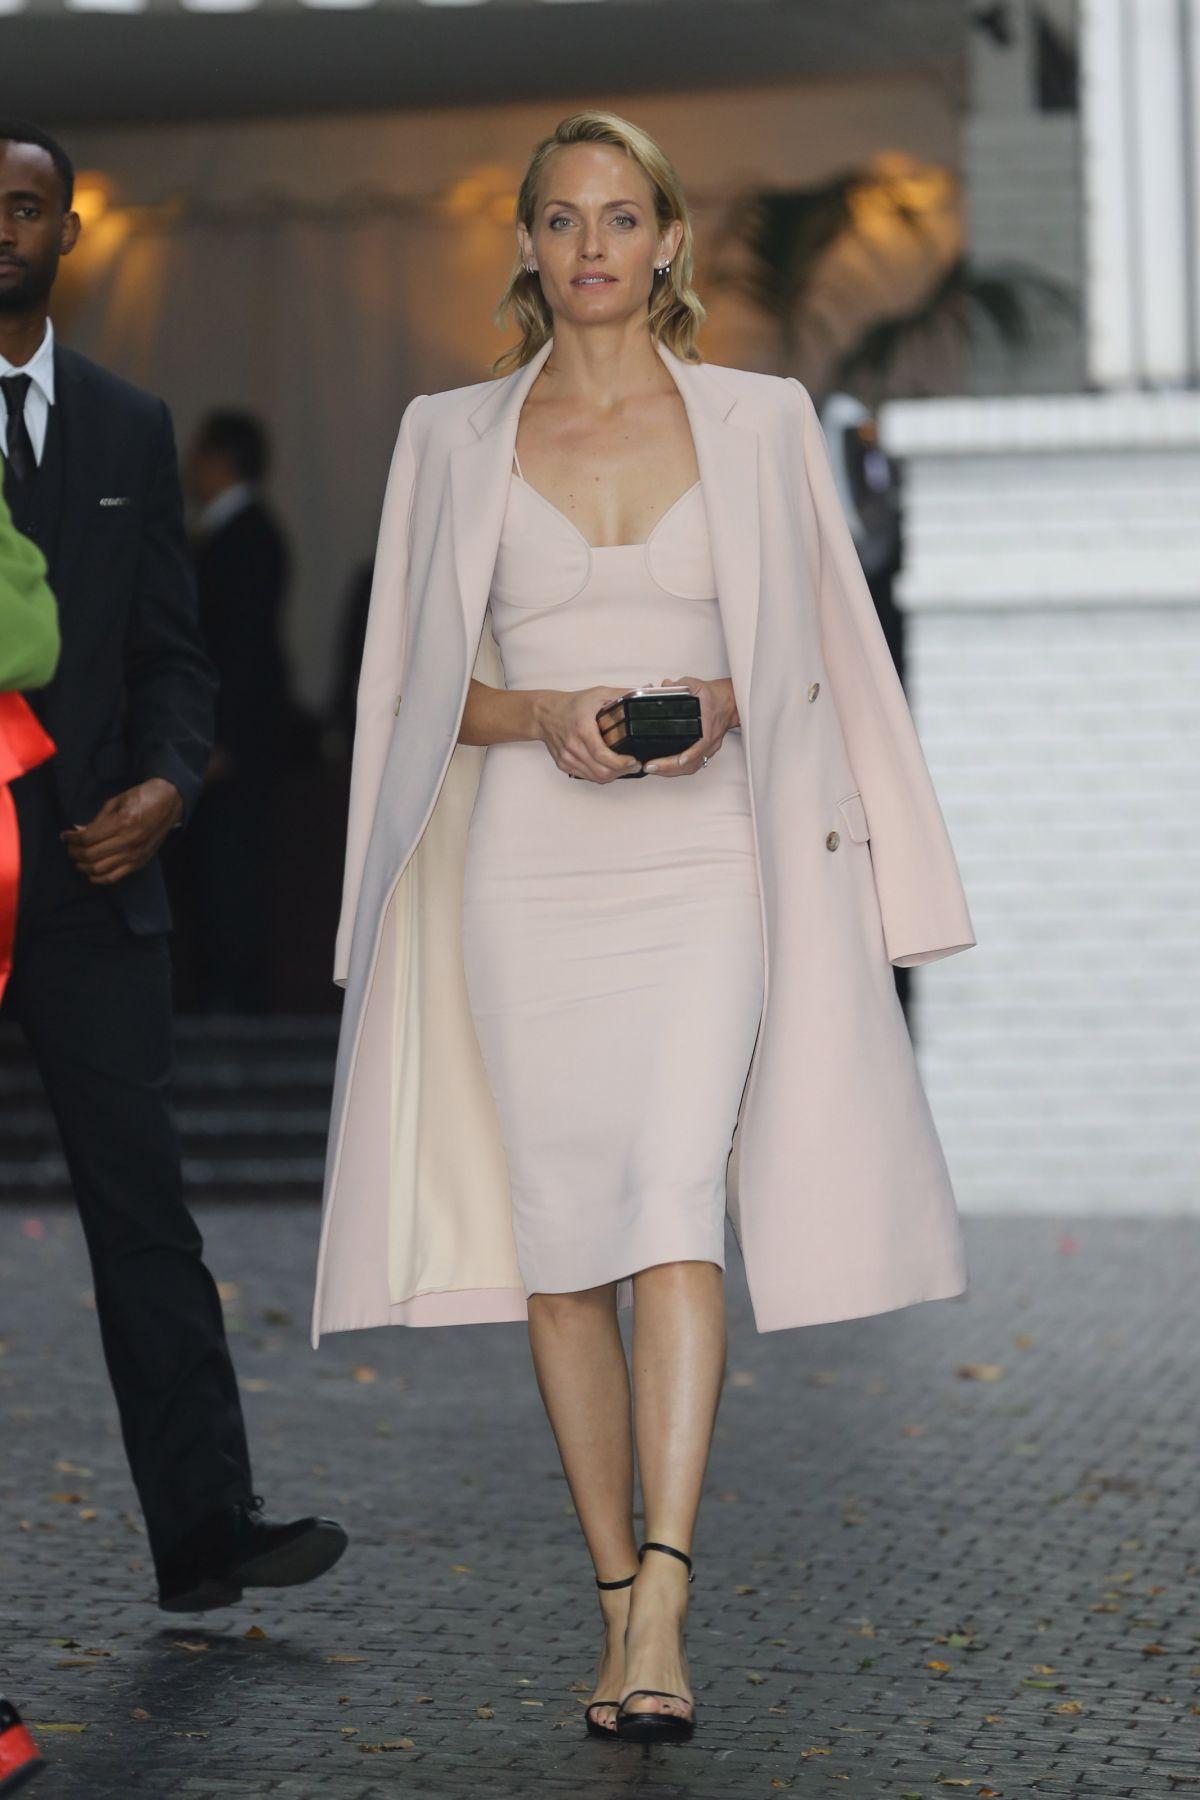 Amber valletta at cfda vogue fashion fund fashion show in los angeles